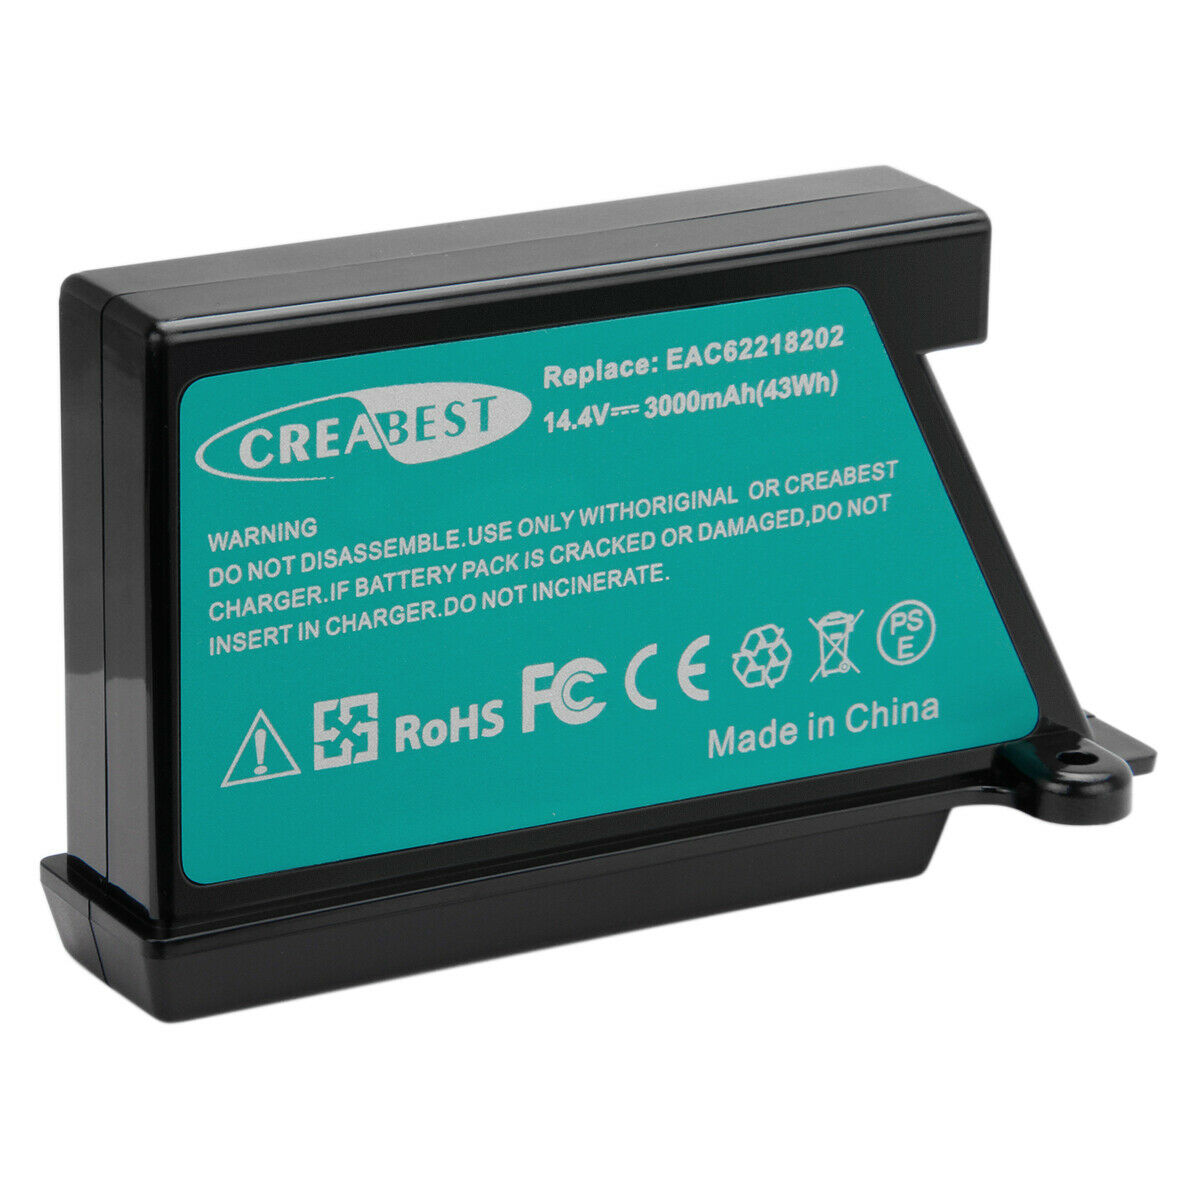 VR5901LVM Akku Batterie 3000mAh Li-Ion für LG Hom-Bot VR1320B VR34406LV